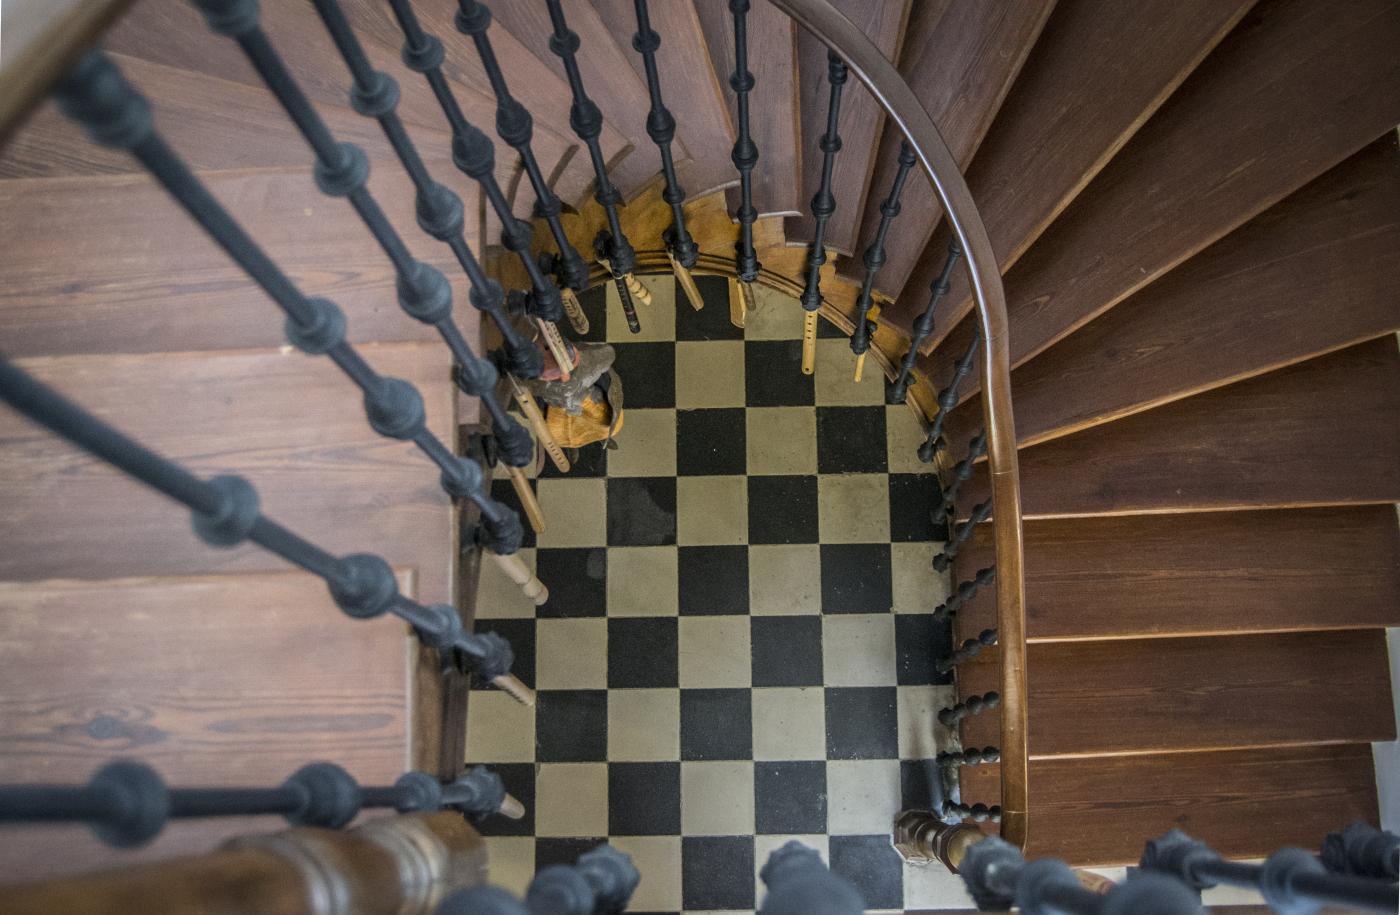 Escalera Casa del Poeta